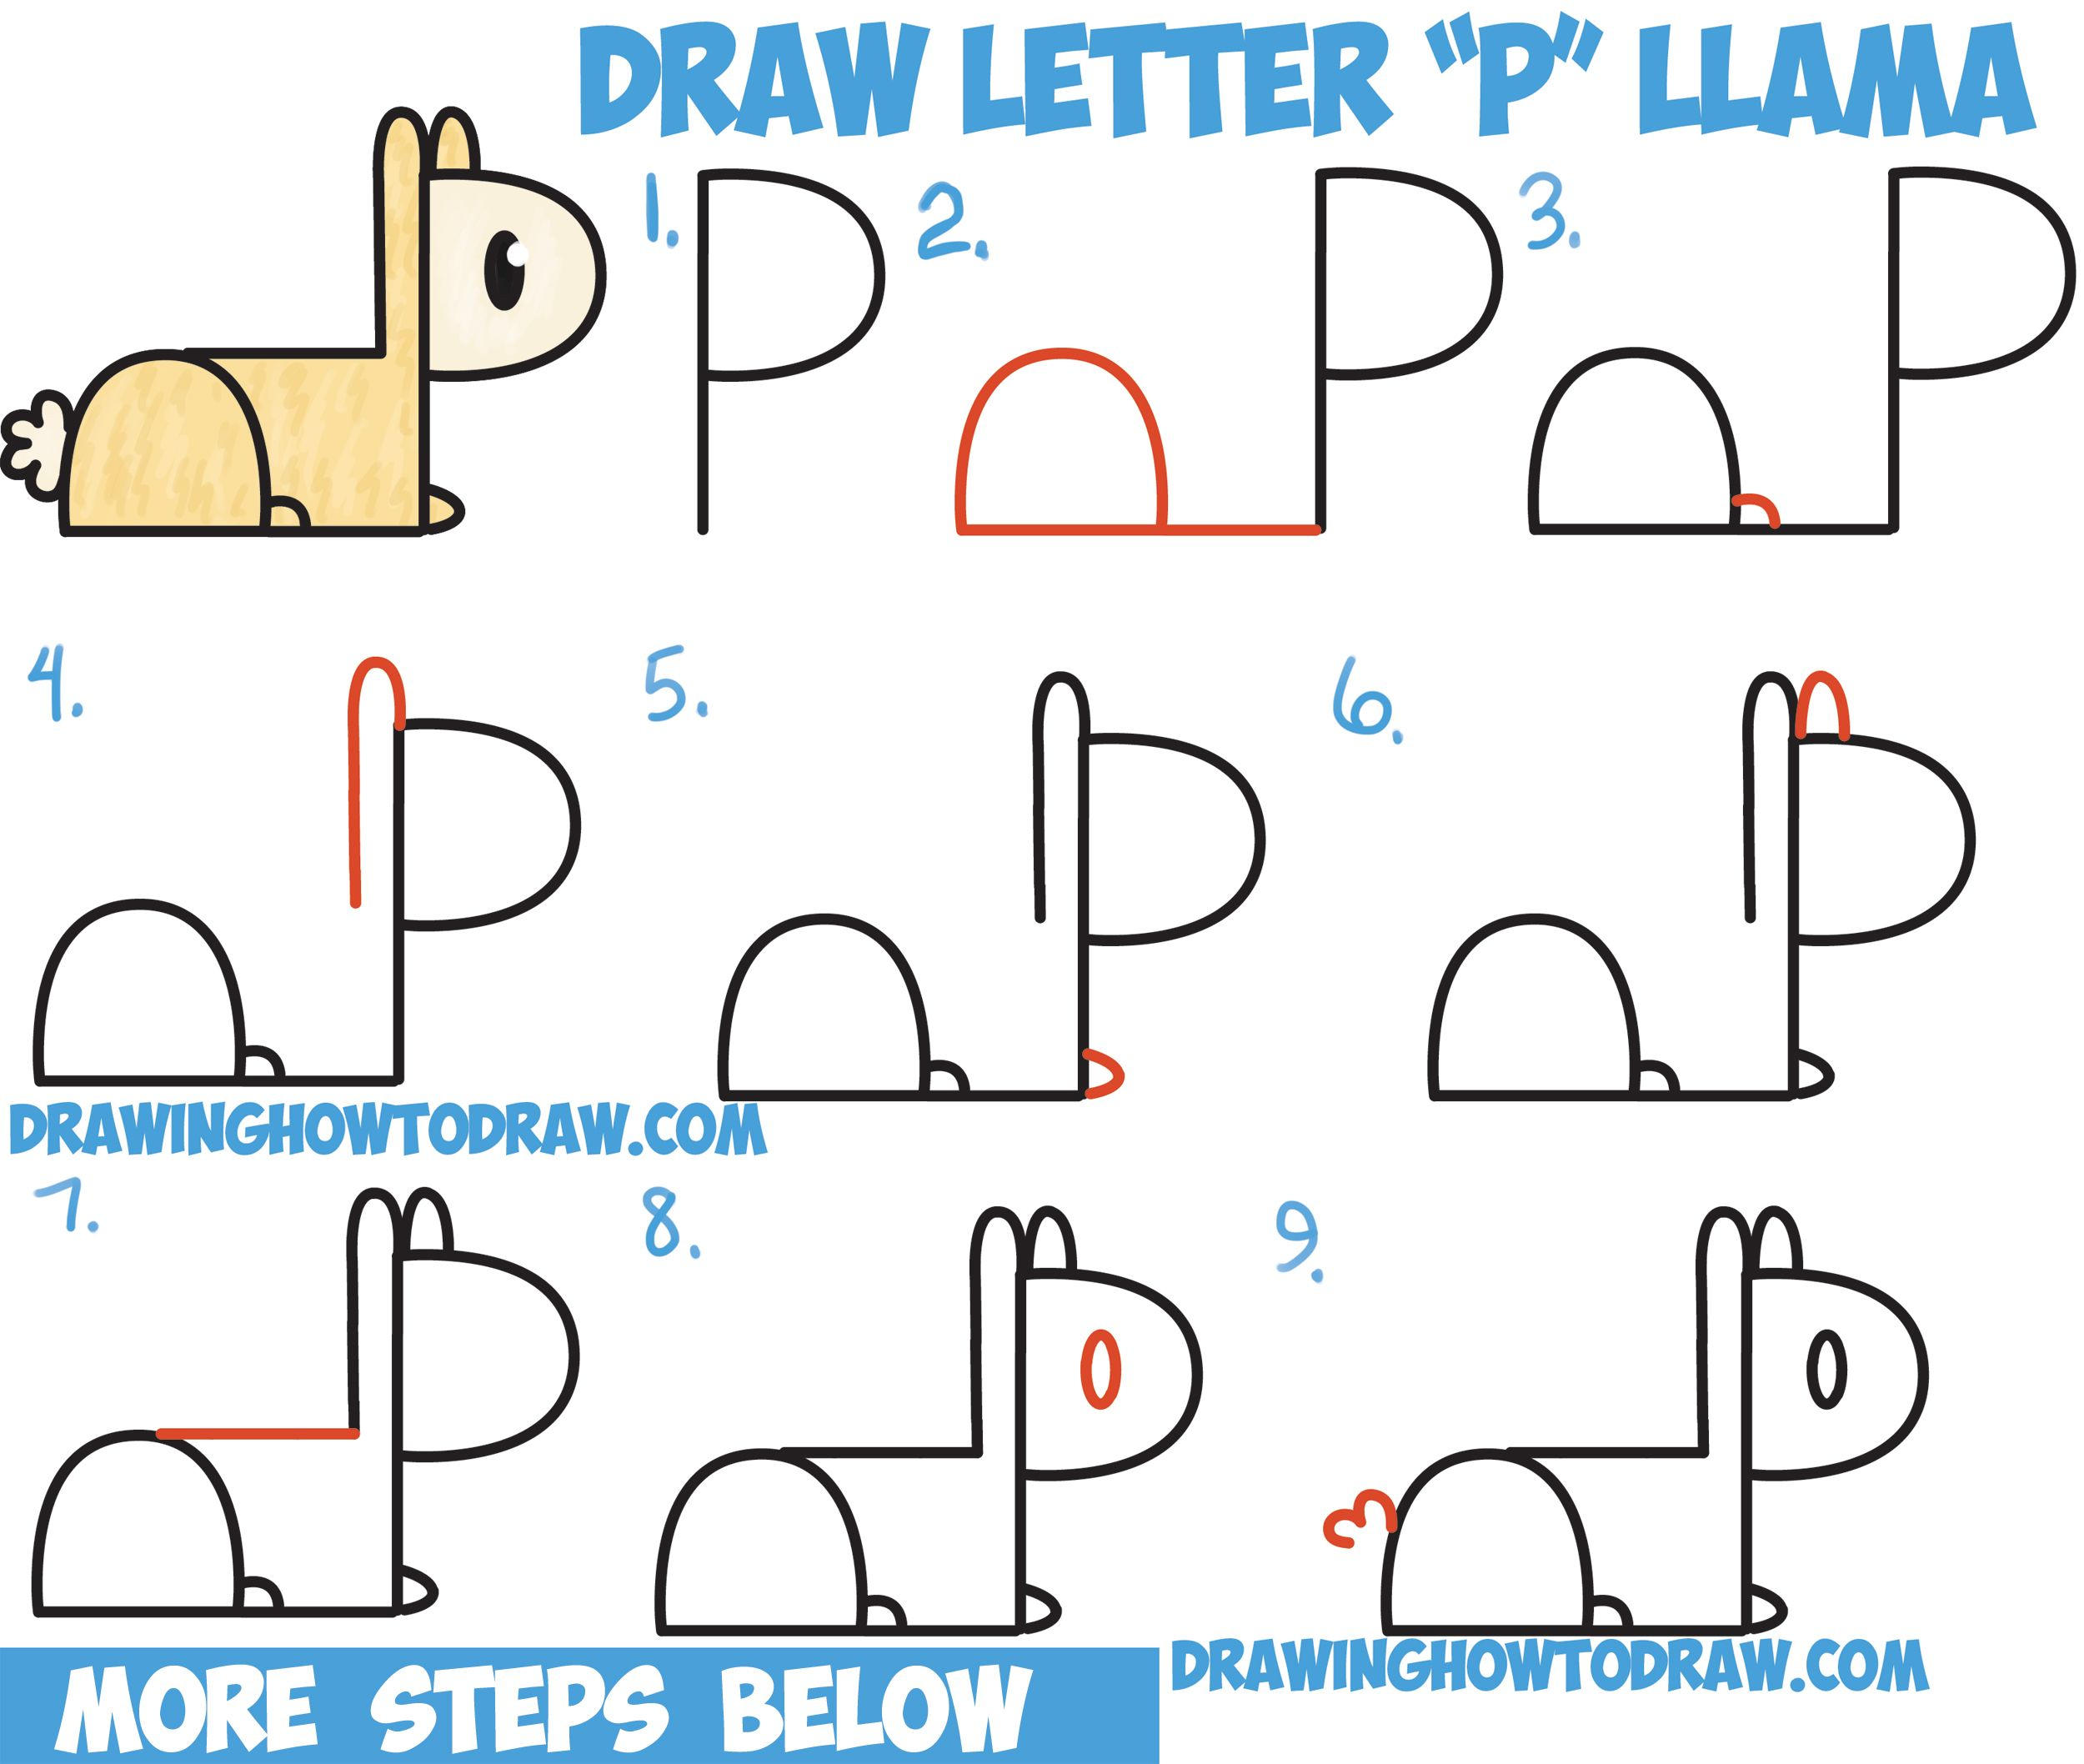 How To Draw Cute Cartoon Kawaii Llama Or Alpaca From P